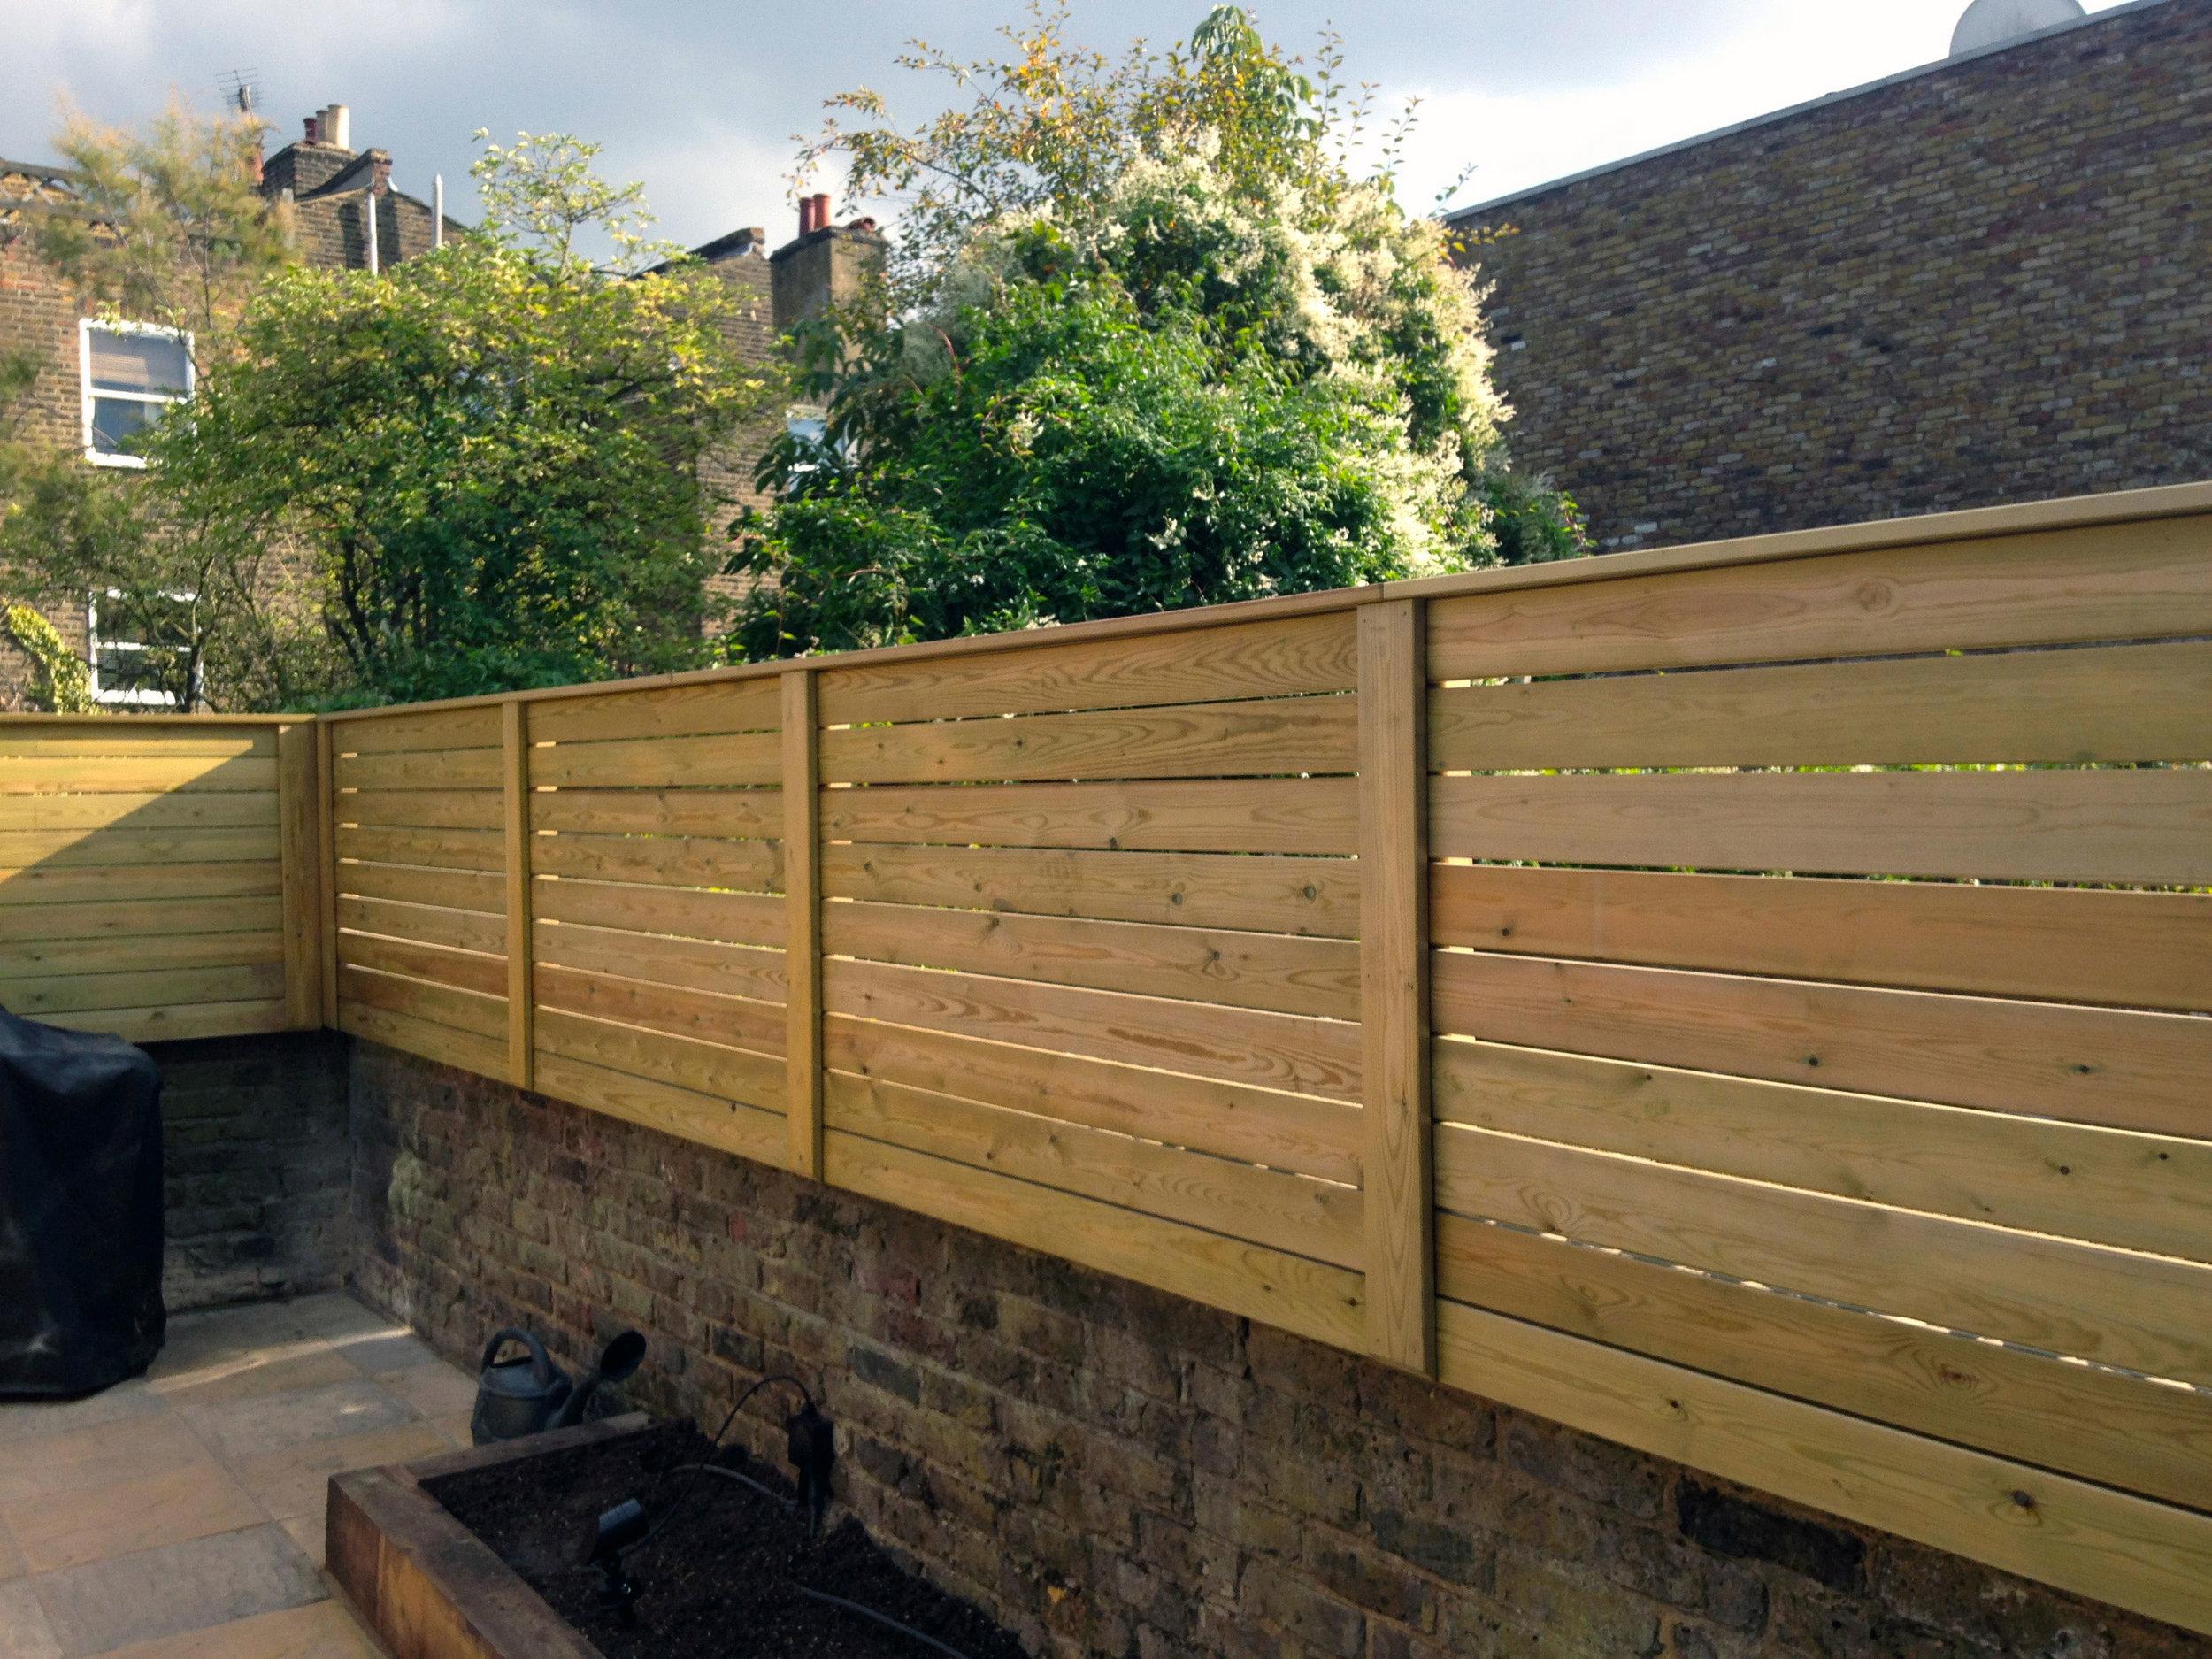 Fence-batten---Gallagher-gardens---Landscaping-Oxford.jpg